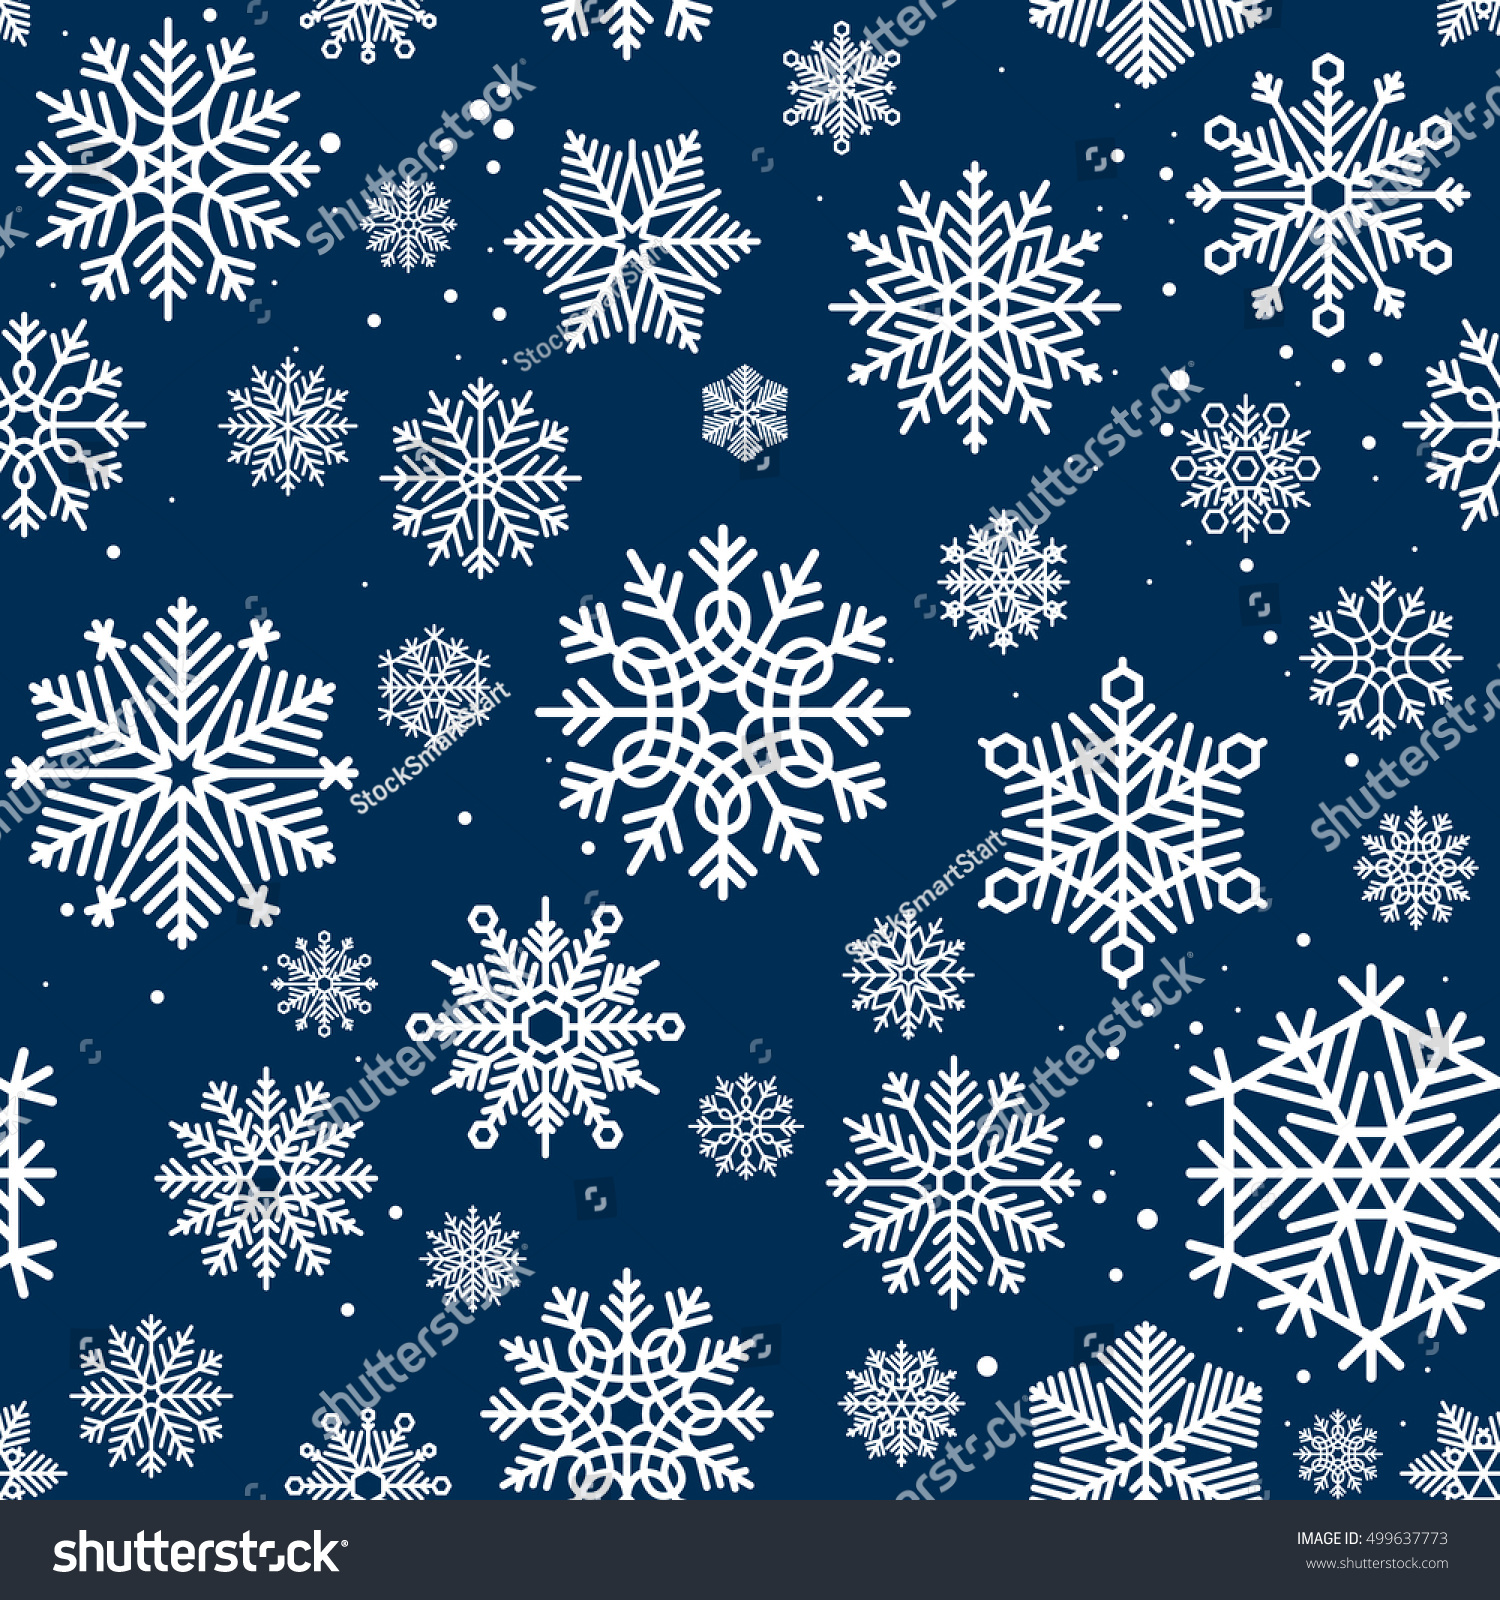 snow vector pattern - photo #46